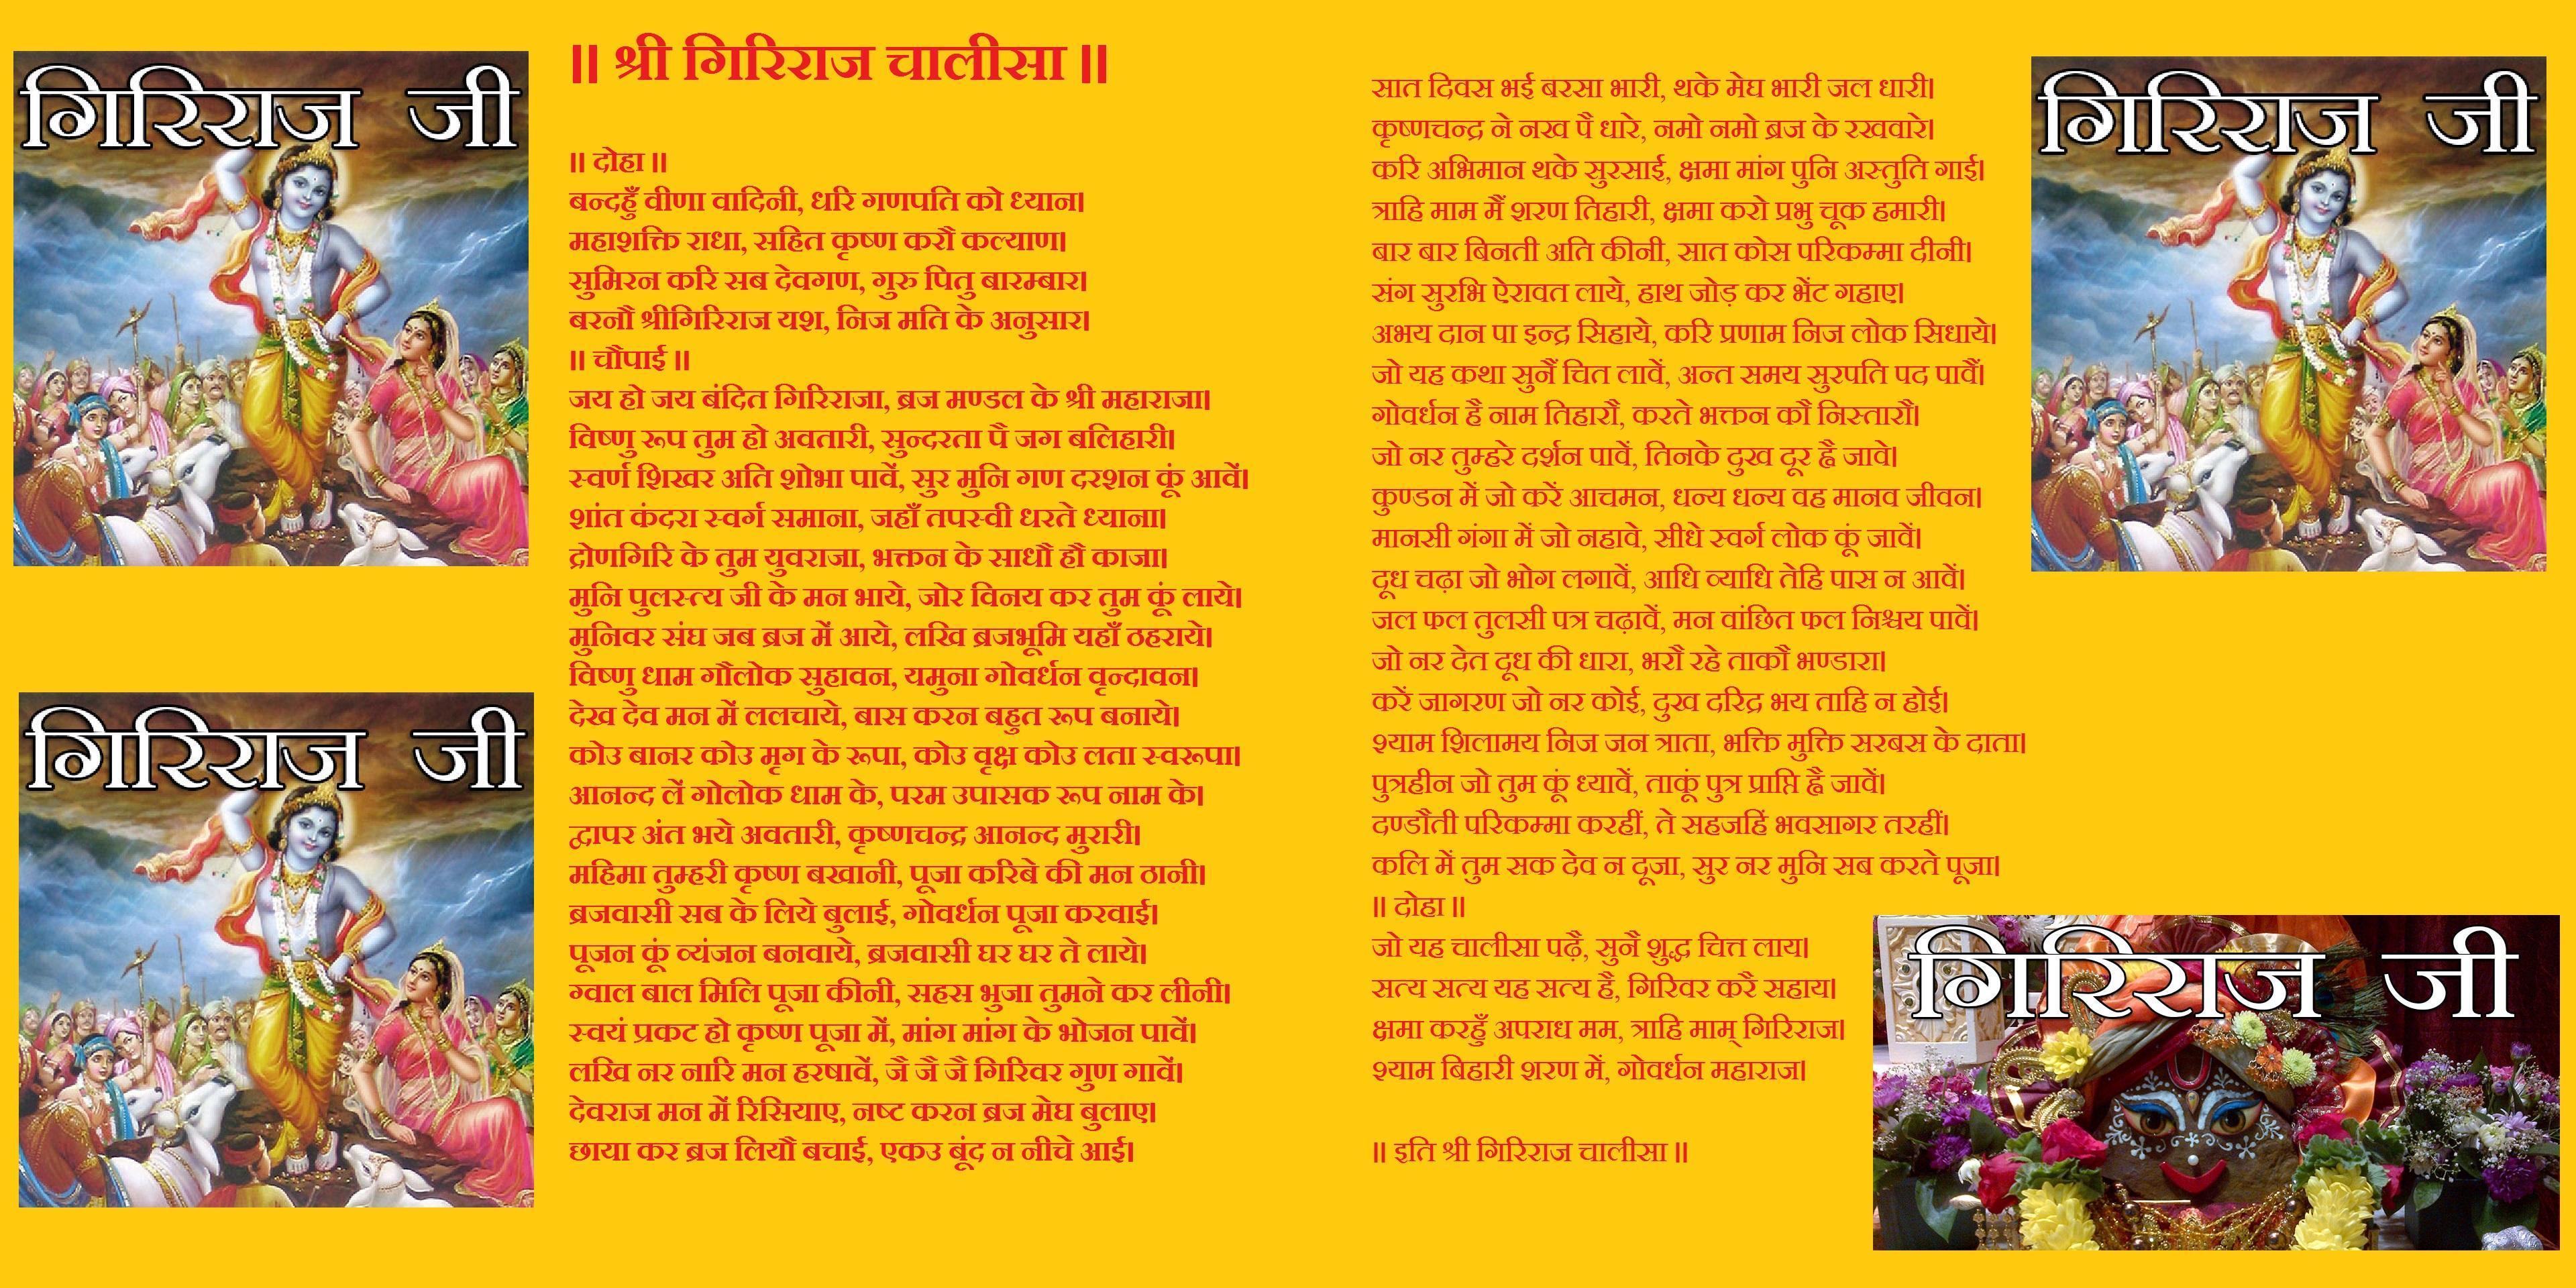 श्री गिरिराज चालीसा | INDIAN STATES AND IMPORTANT FESTIVALS